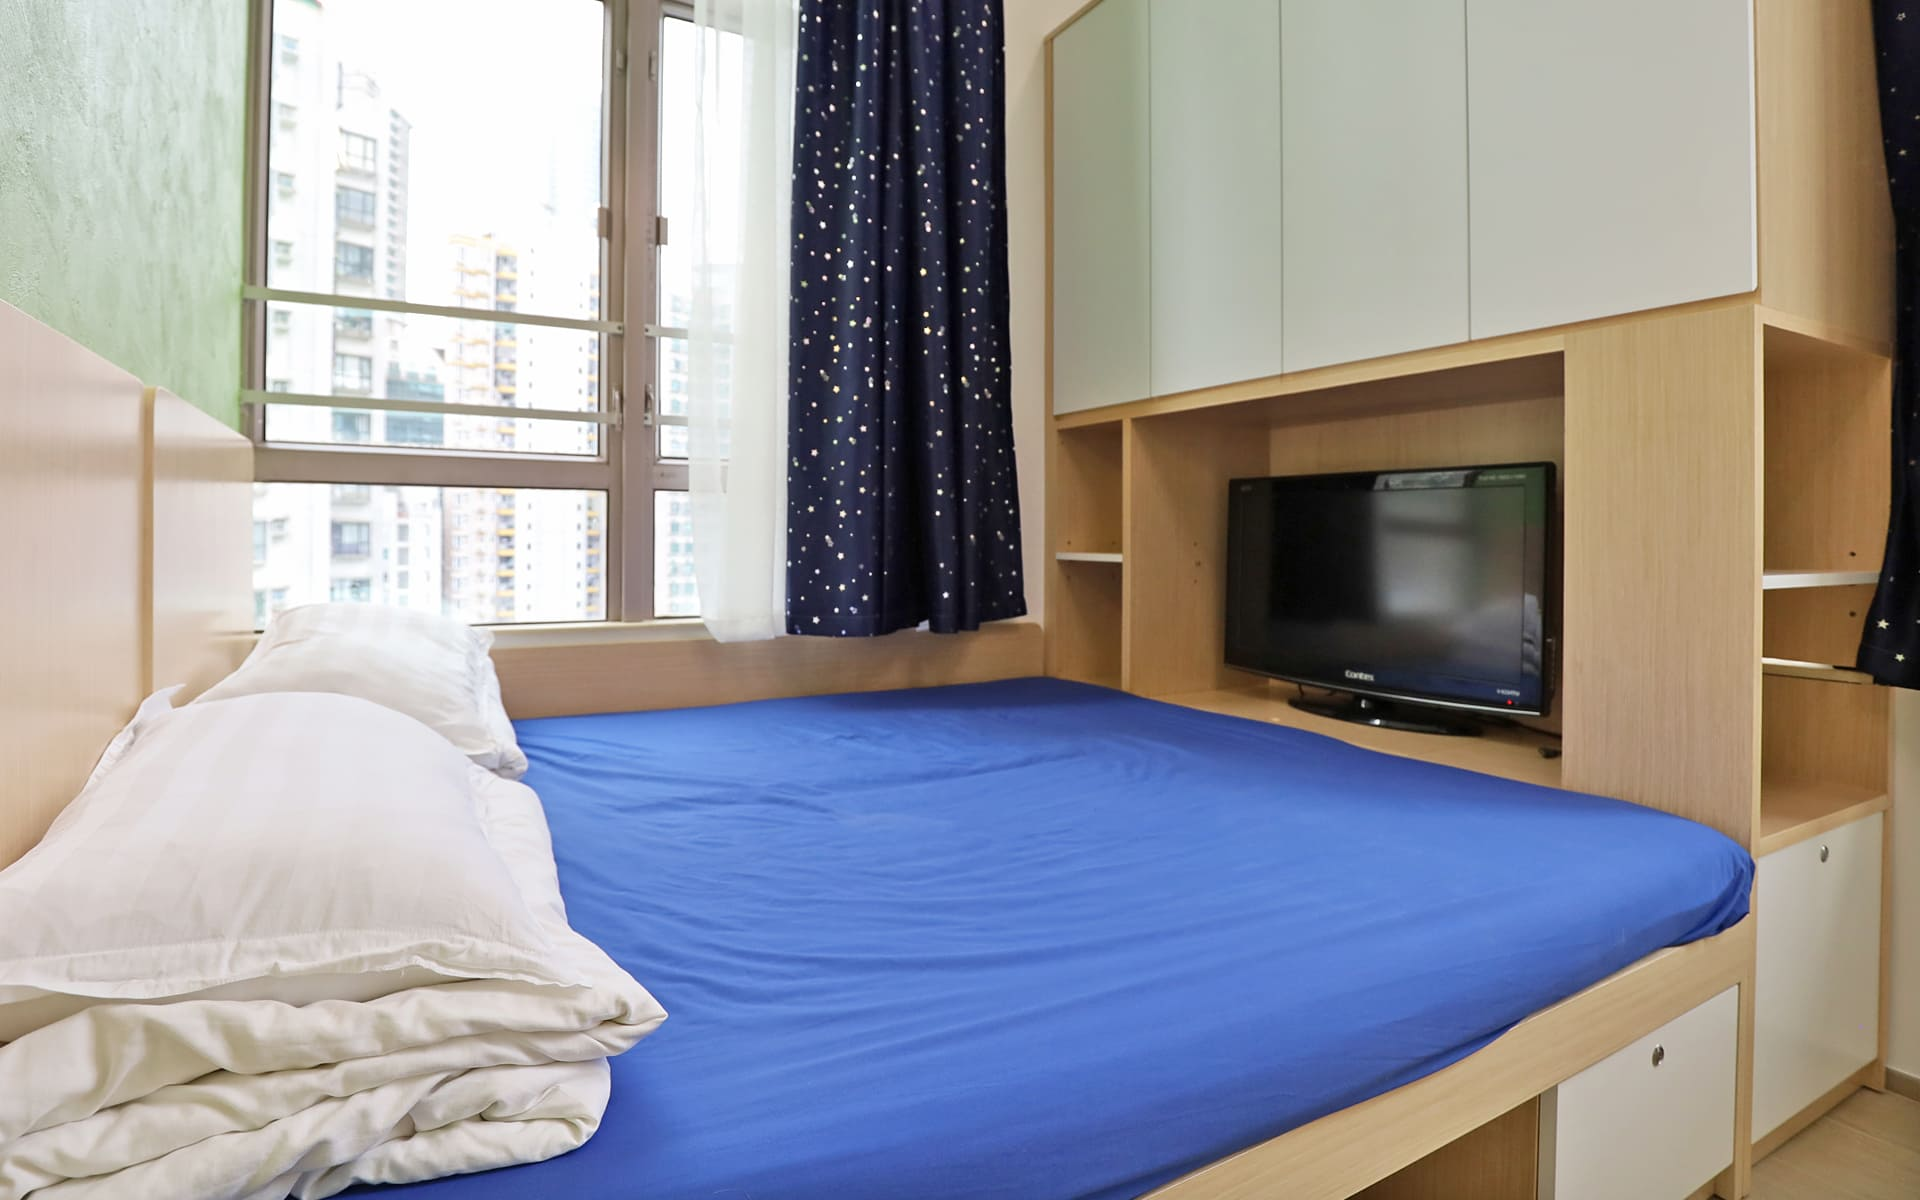 hk_service_apartment_13421707451596691912.jpg